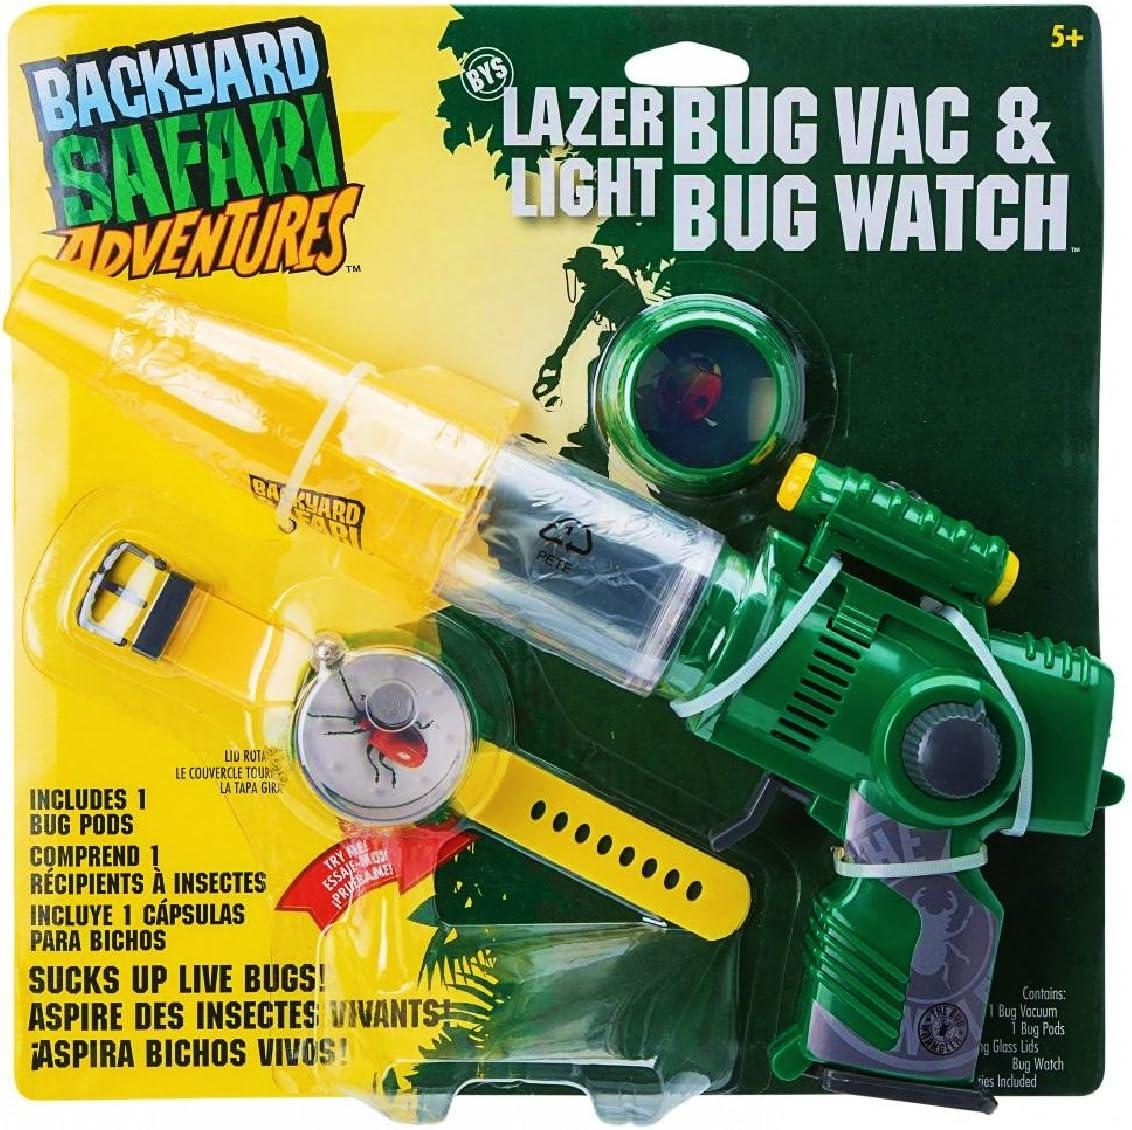 Backyard Safari Laser Bug Vacuum & Watch